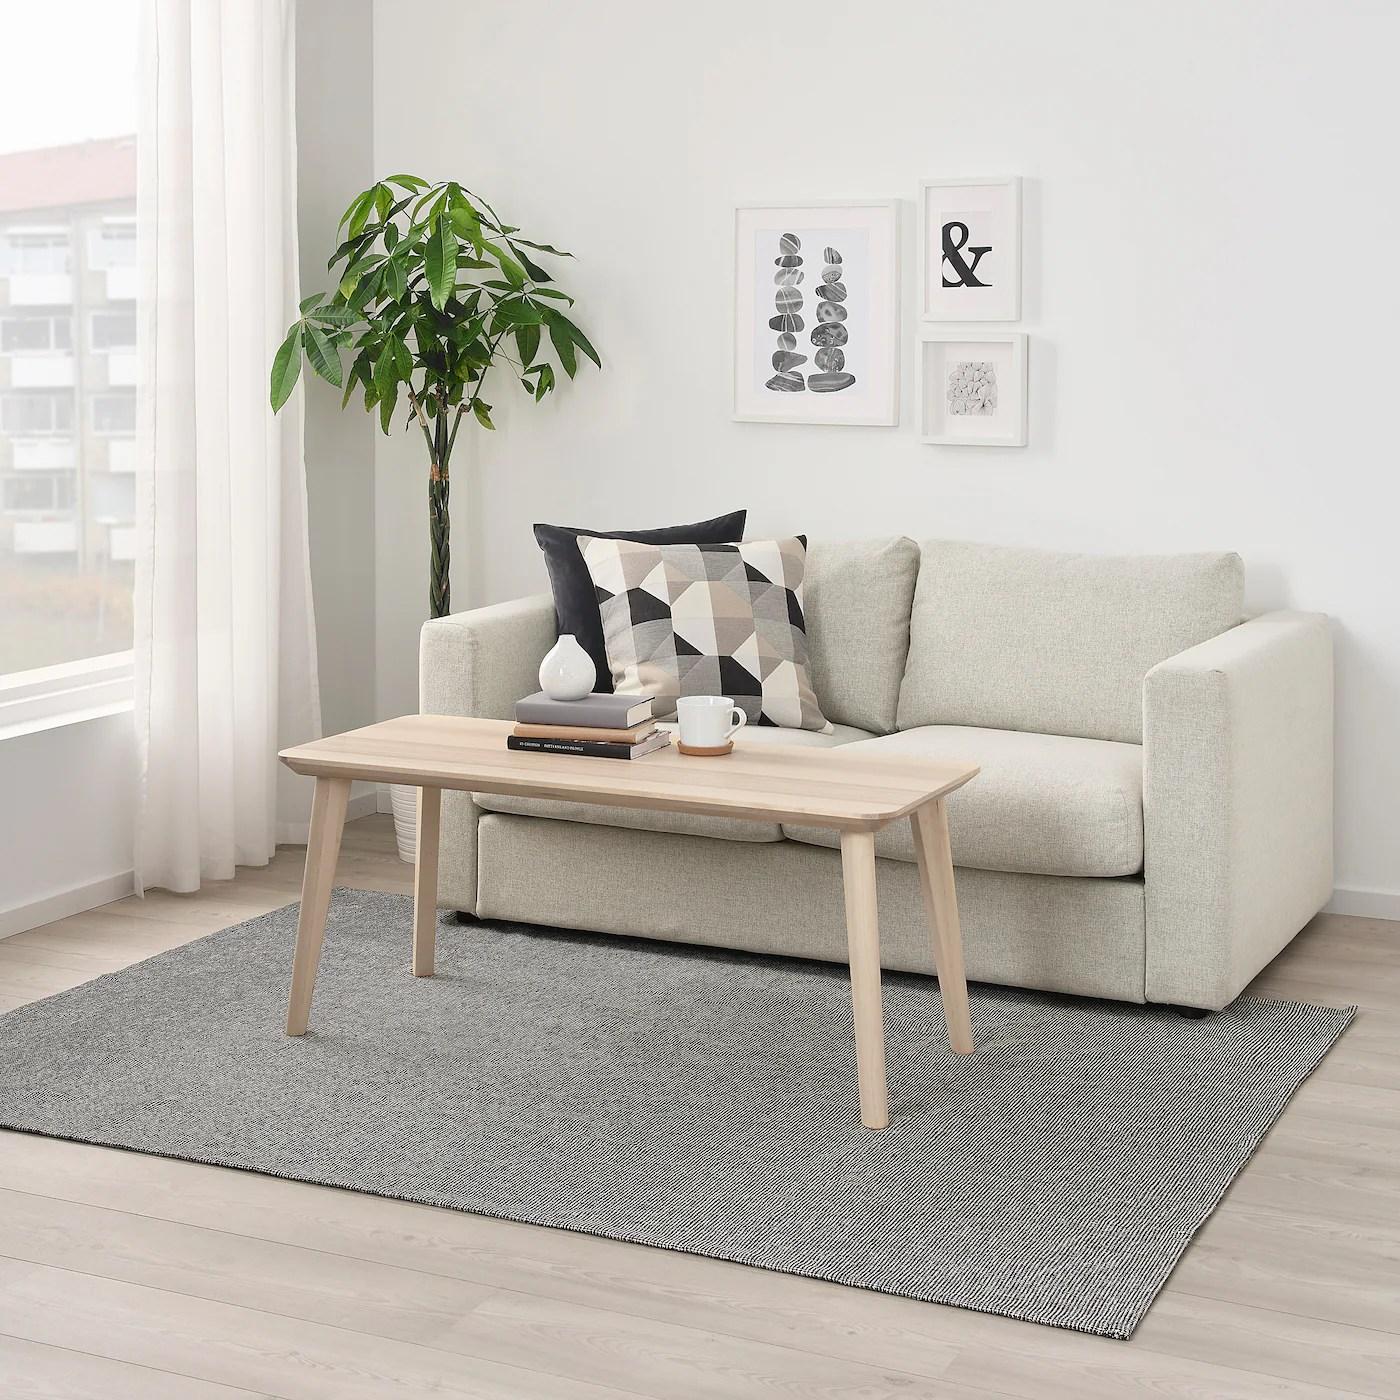 Tiphede Taeppe Fladvaevet Gra Hvid 155x220 Cm Ikea